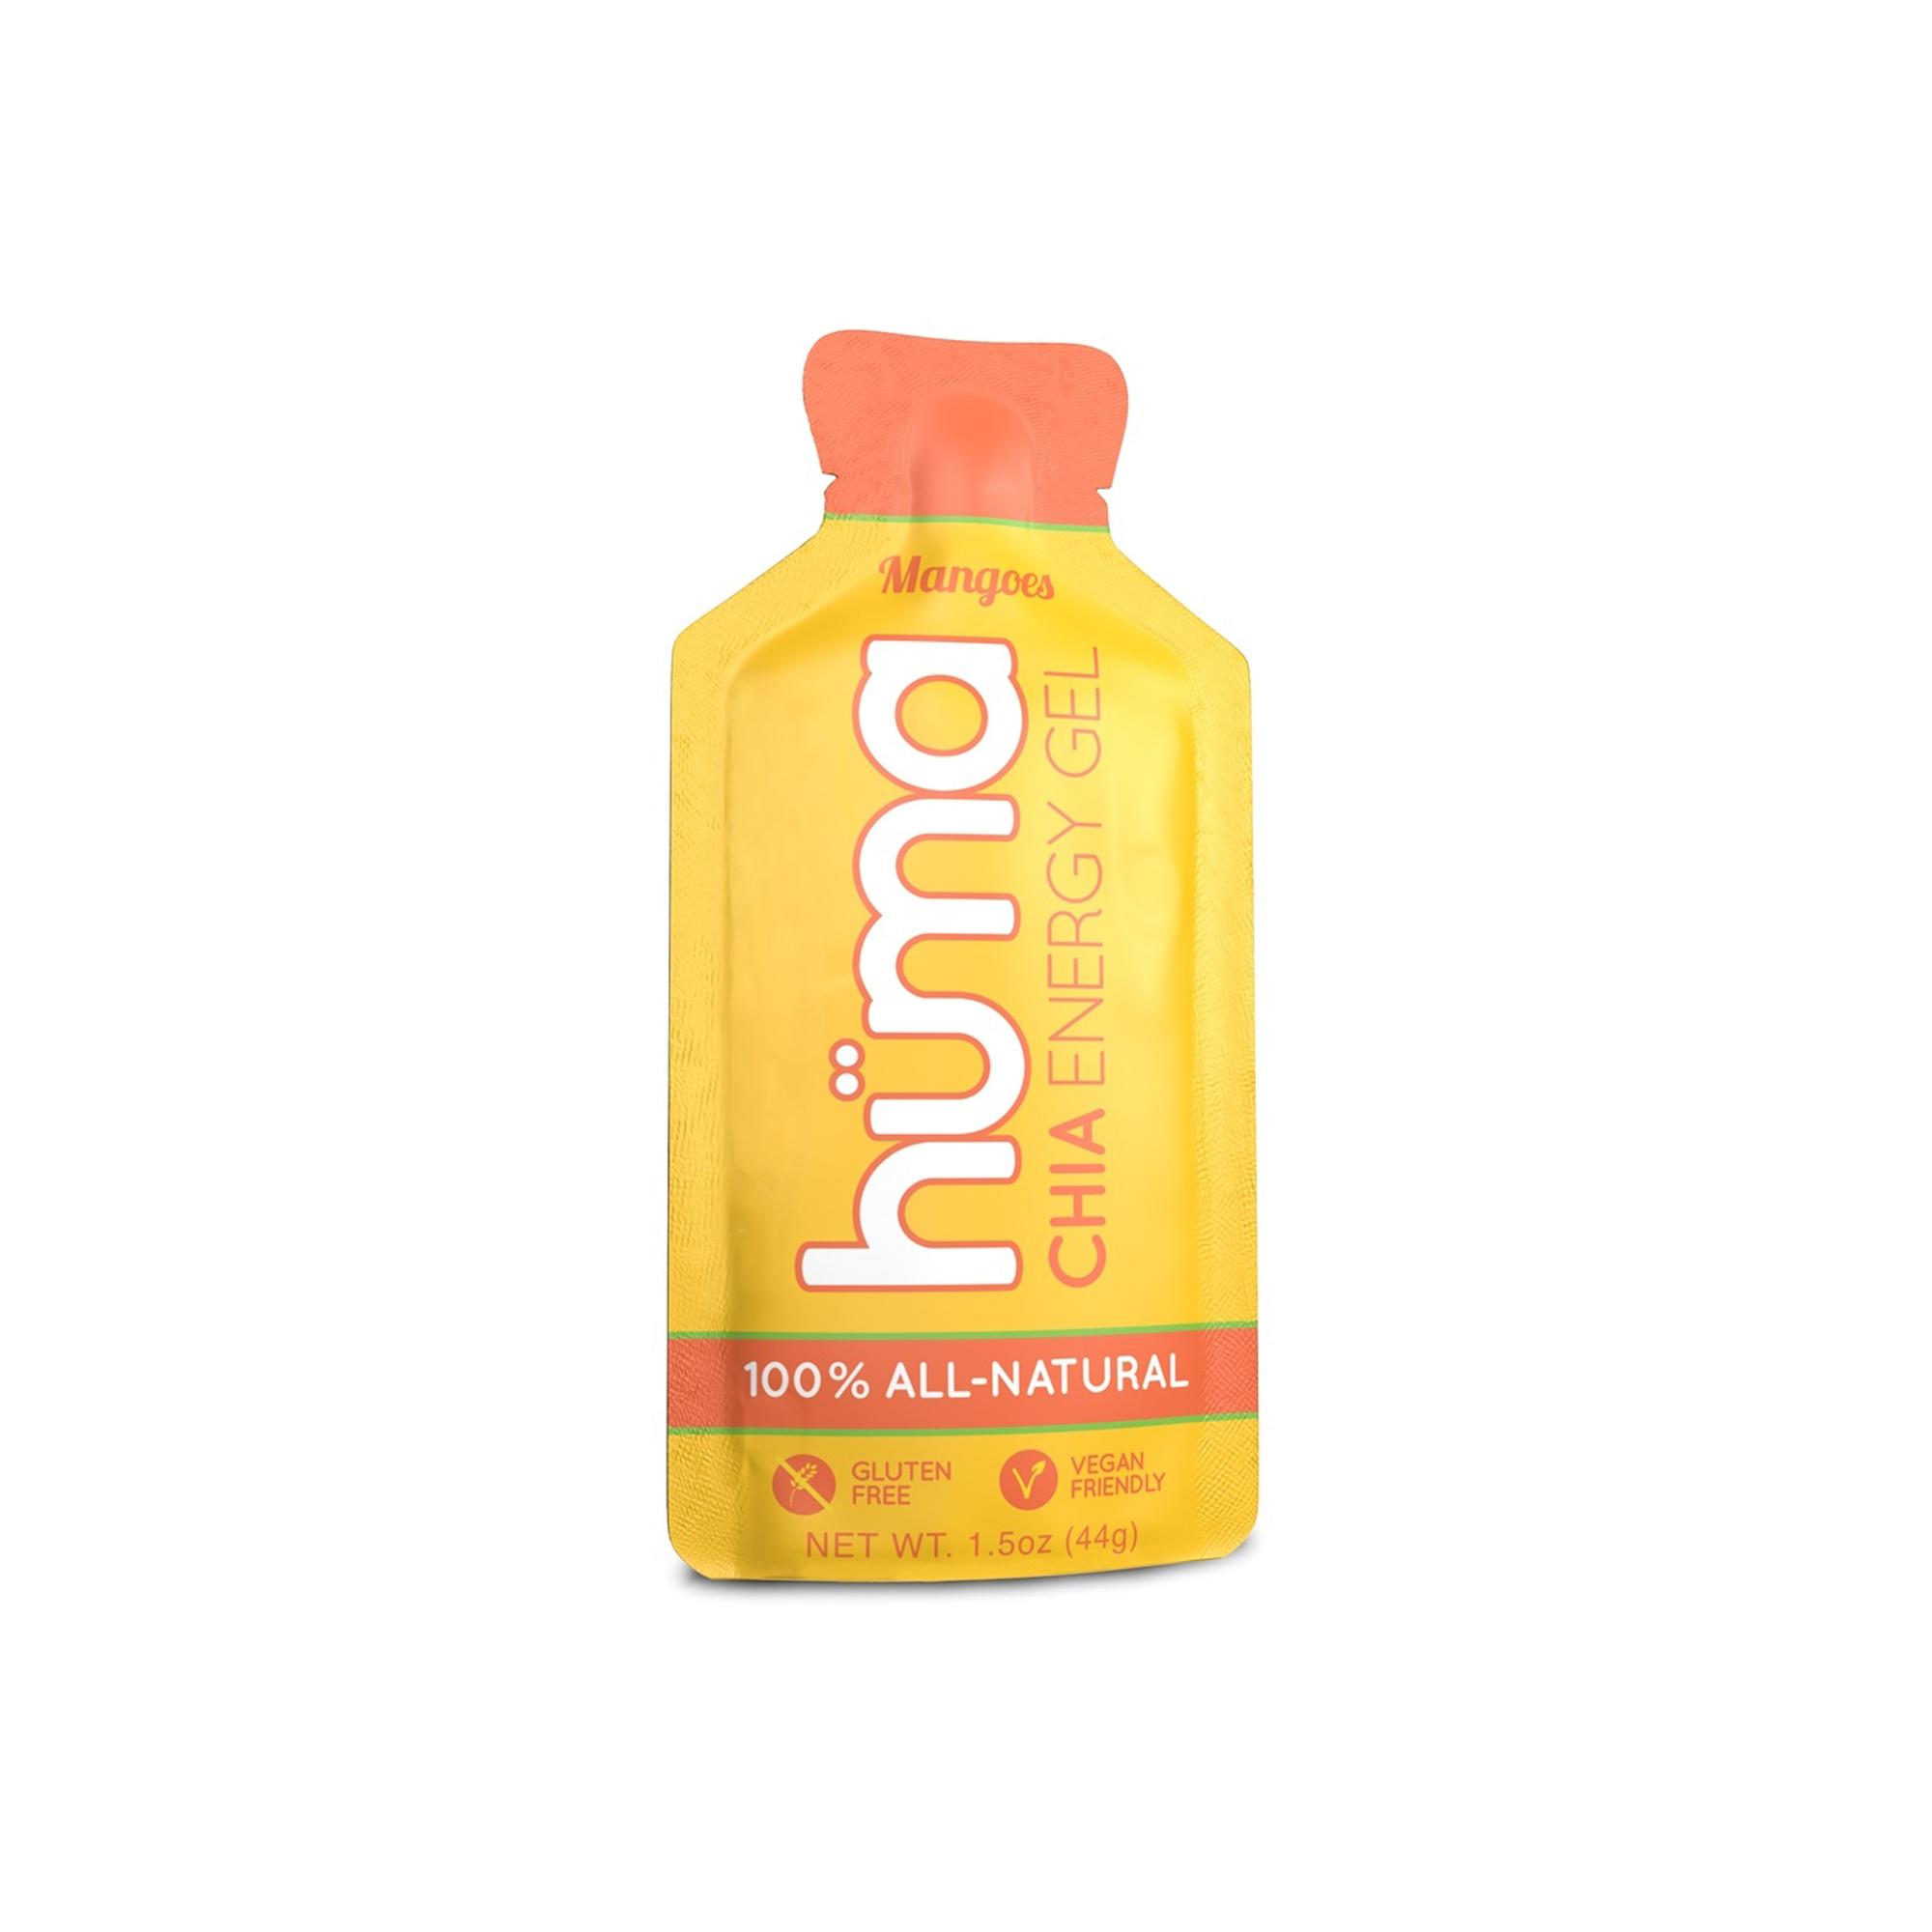 Hüma - Chia Mangoes Caffeine Free 43g